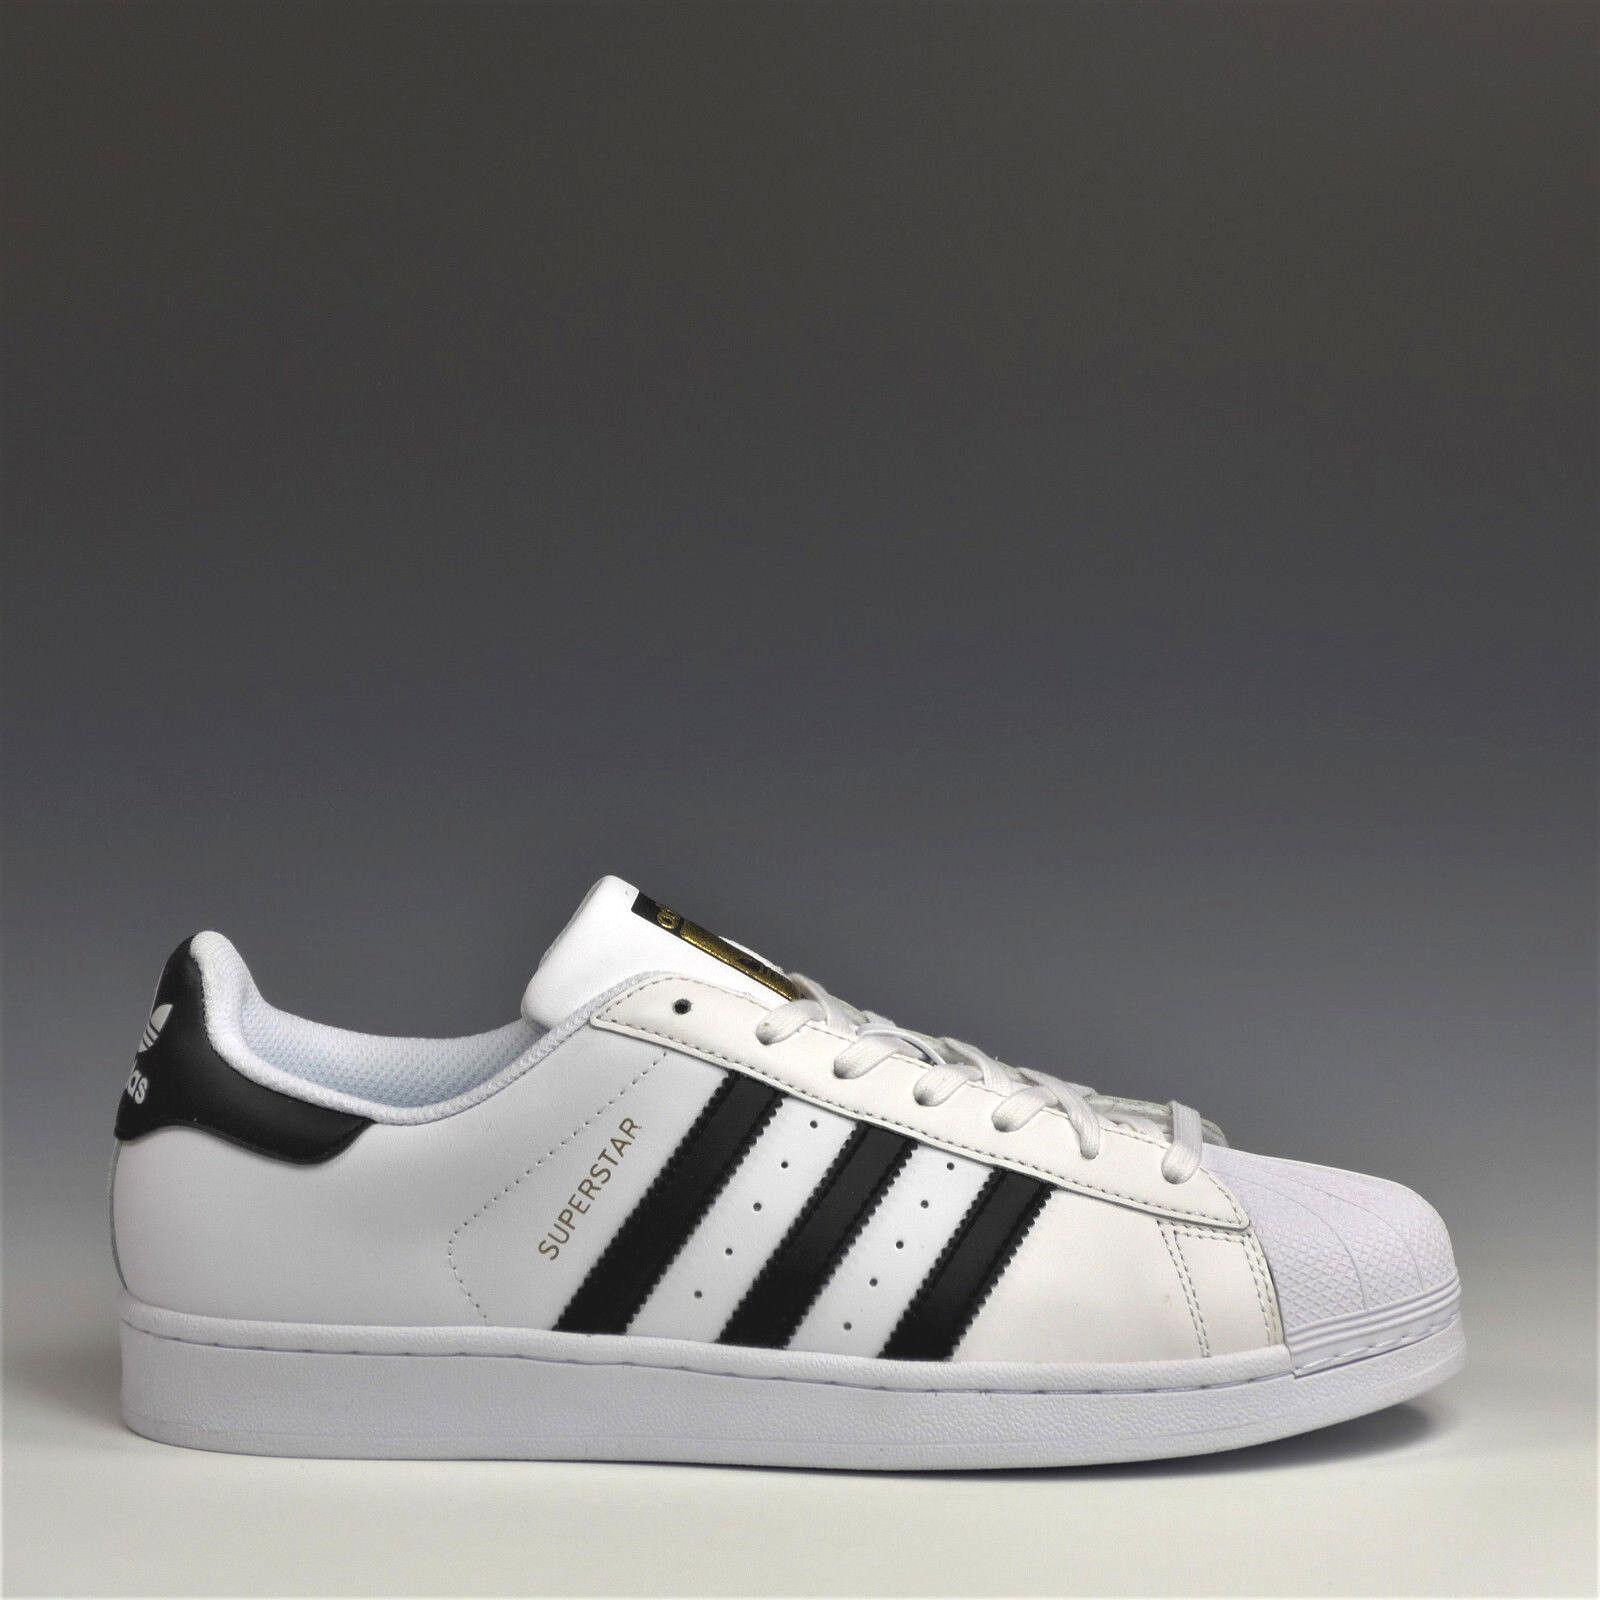 ADIDAS Originals Superstar c77124 Sneaker Scarpe da Uomo Nuovo